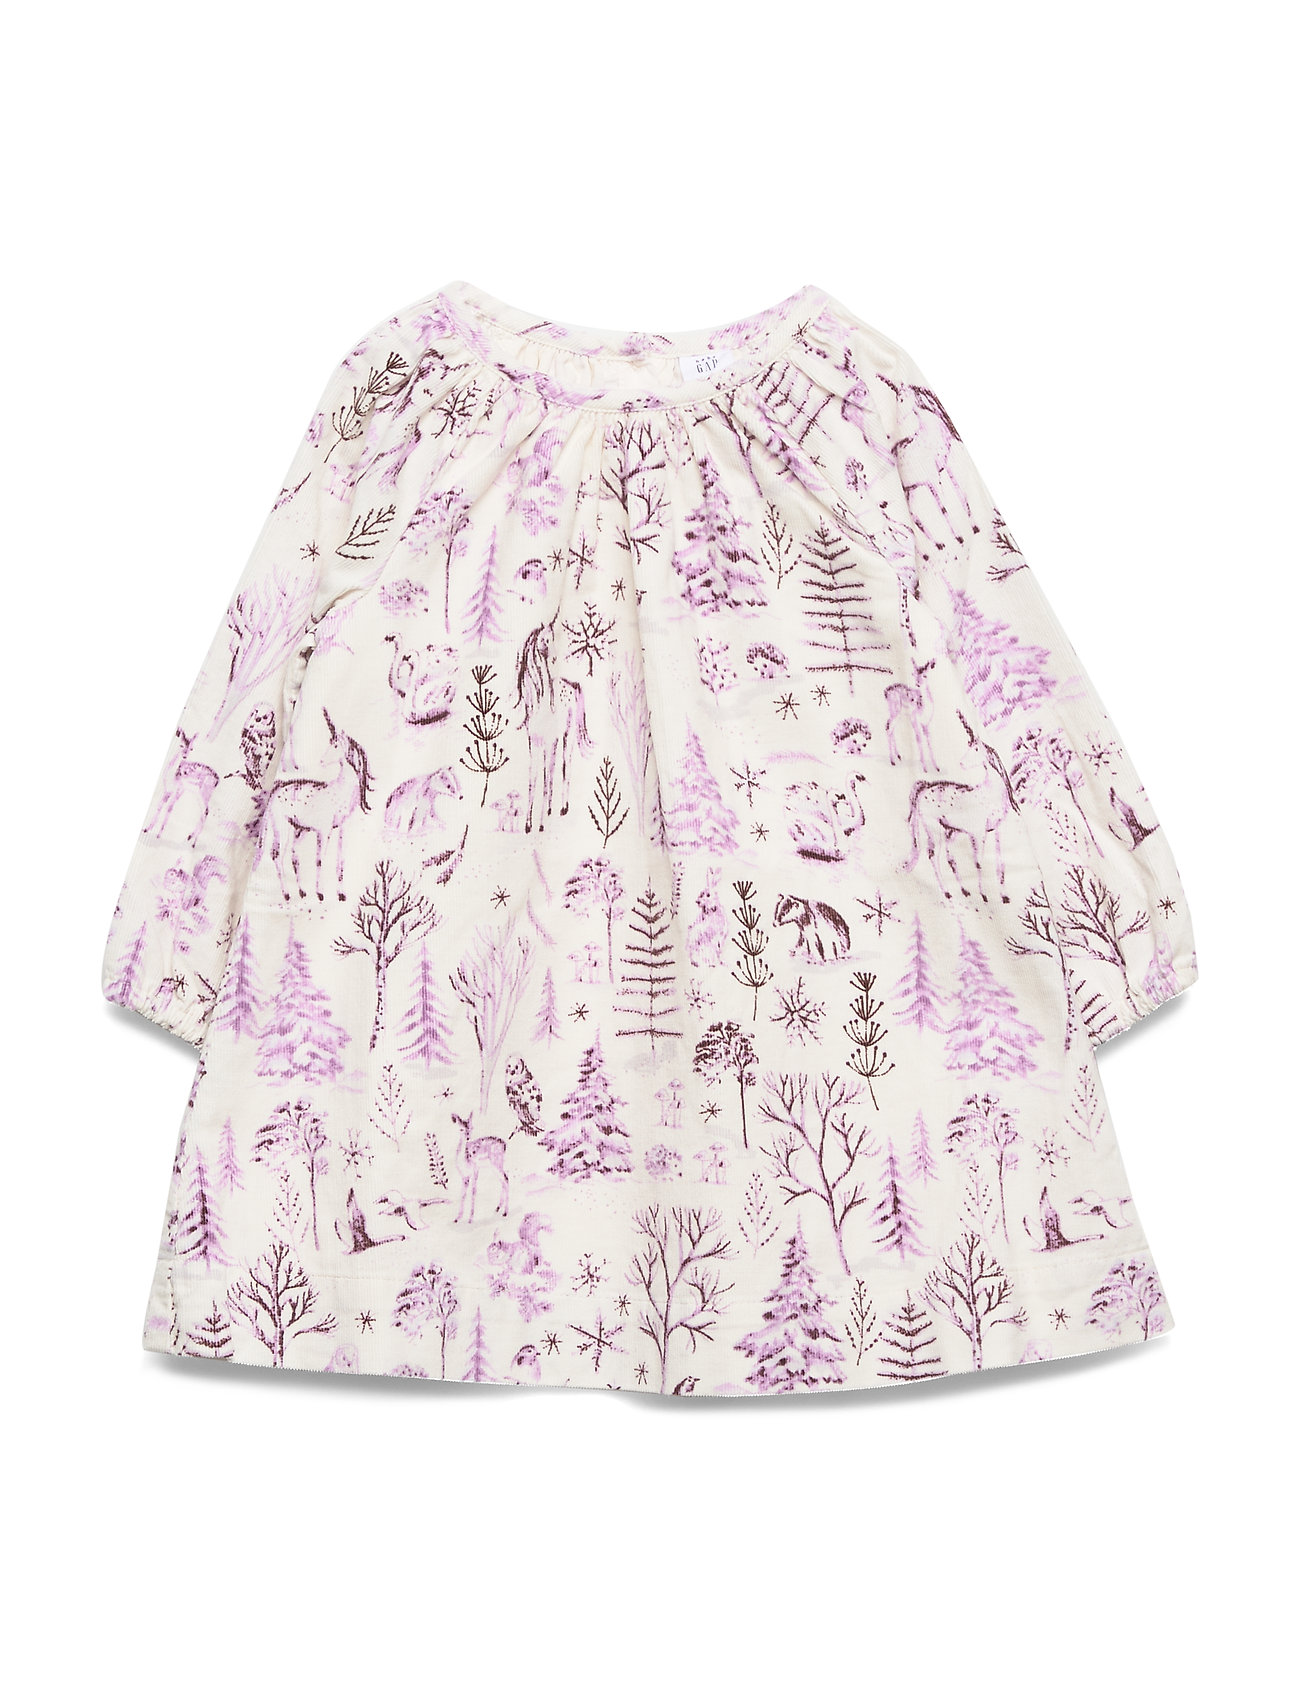 GAP Toddler Unicorn Cord Dress - UNICORNS 647